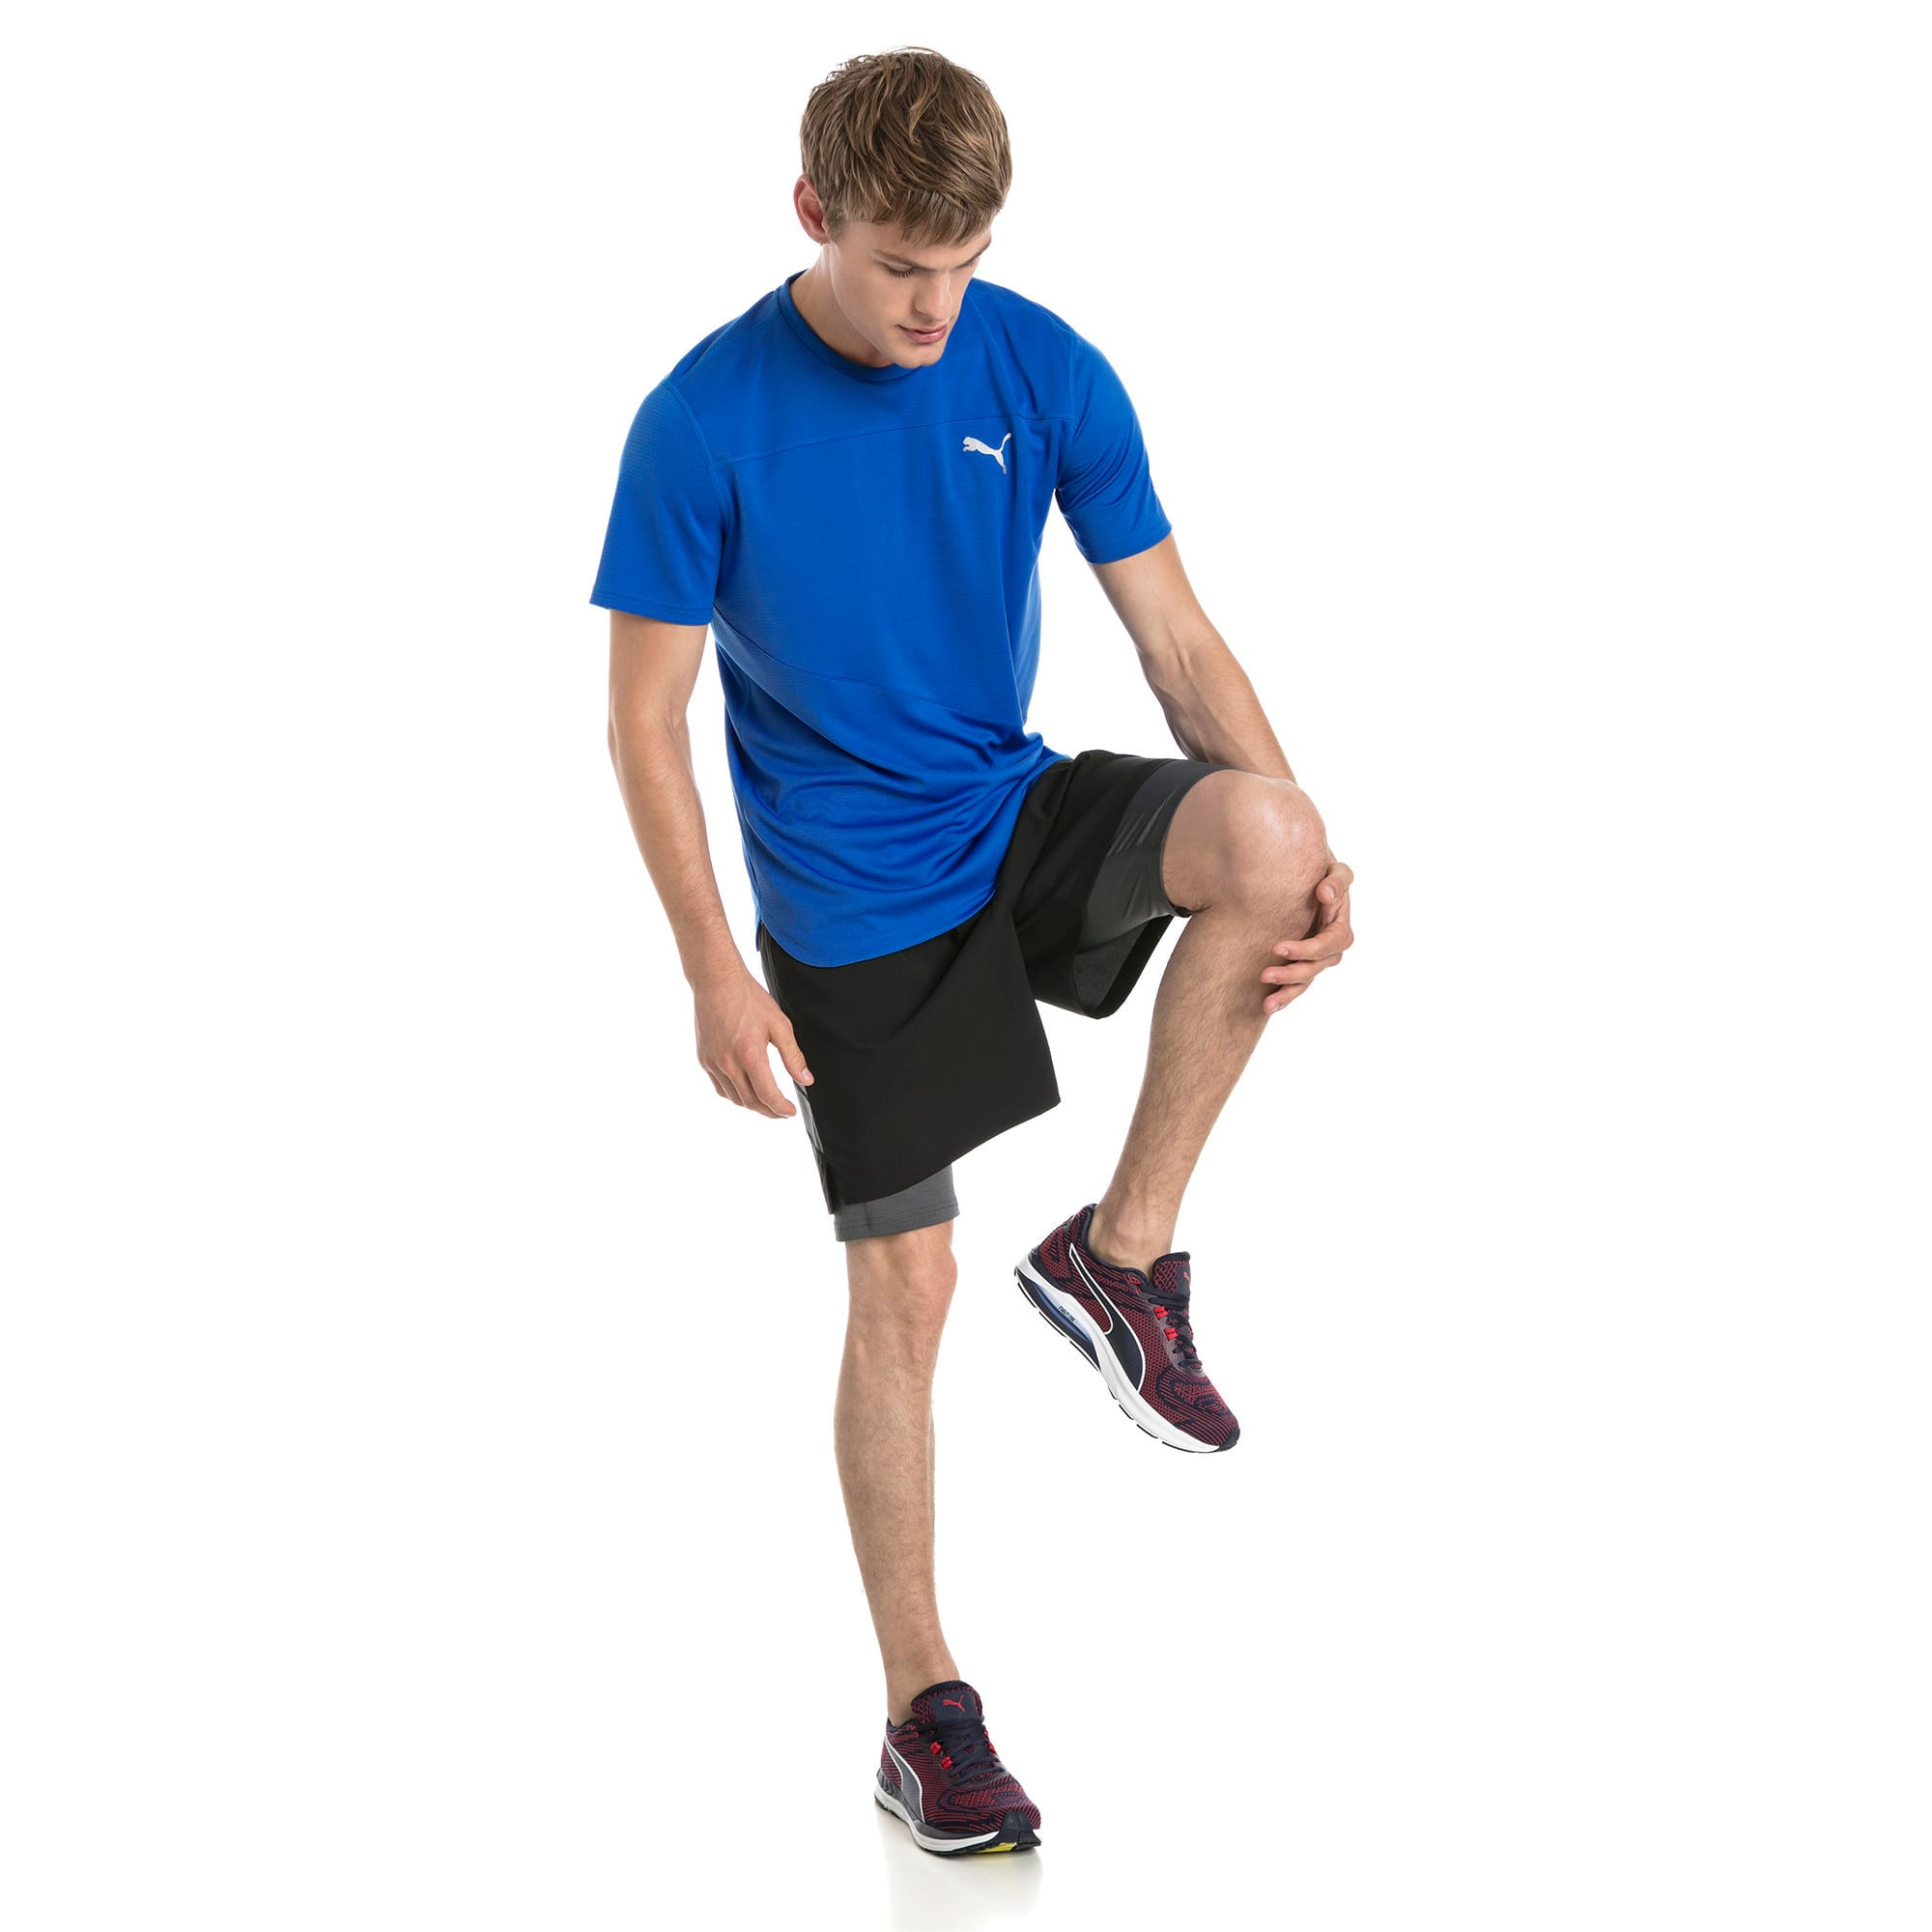 Thumbnail 2 of Running Men's IGNITE Mono T-Shirt, Strong Blue, medium-IND